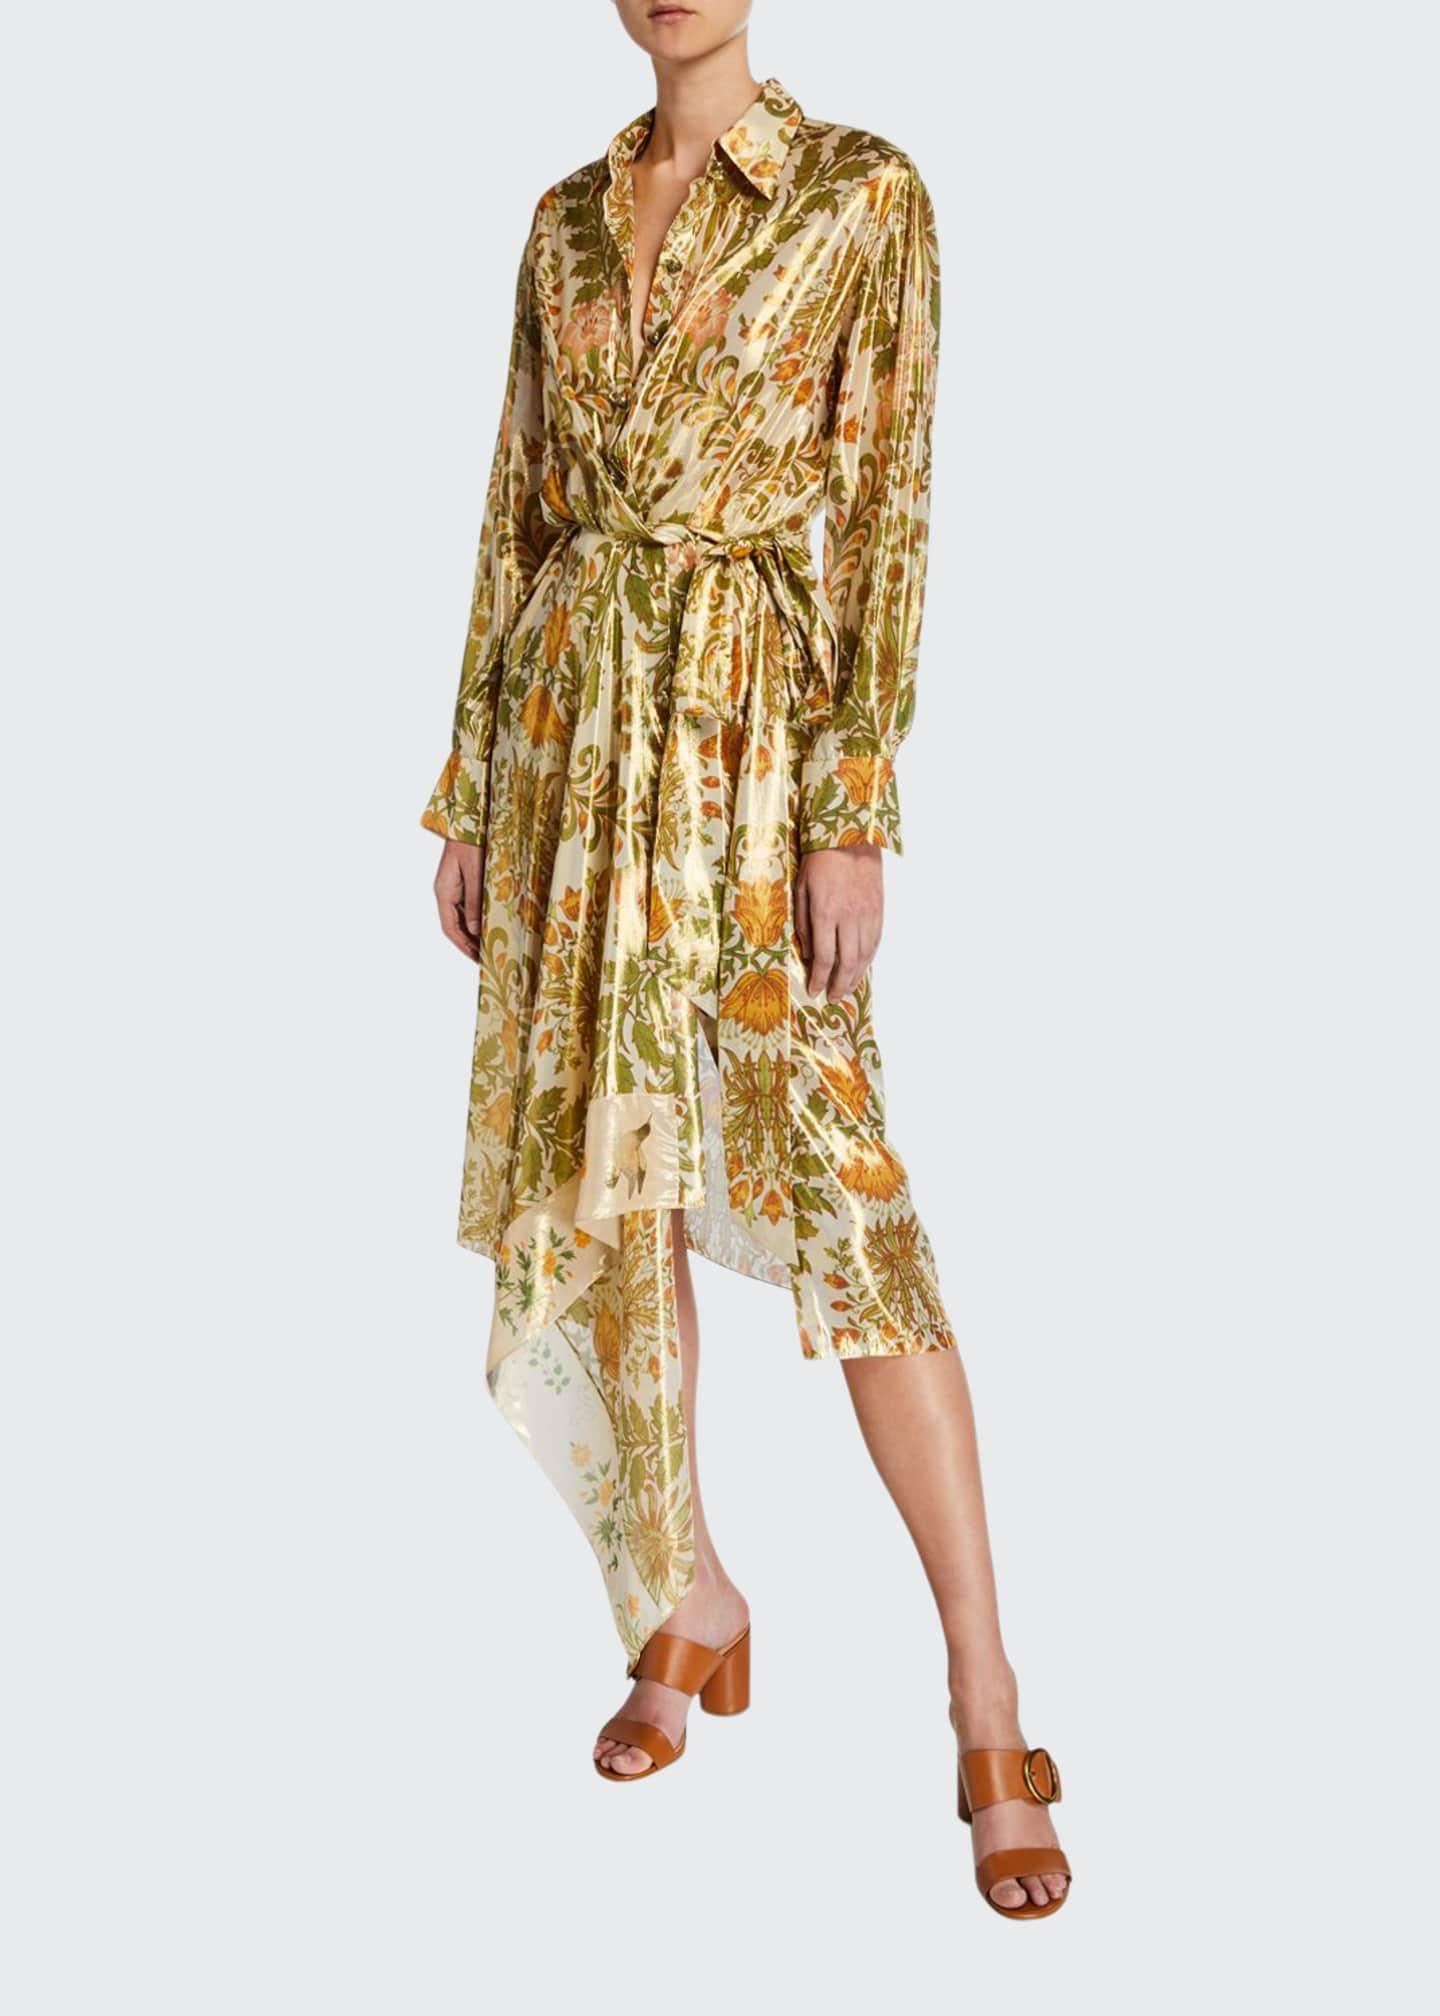 Oscar de la Renta Brocade Print Asymmetric Shirtdress